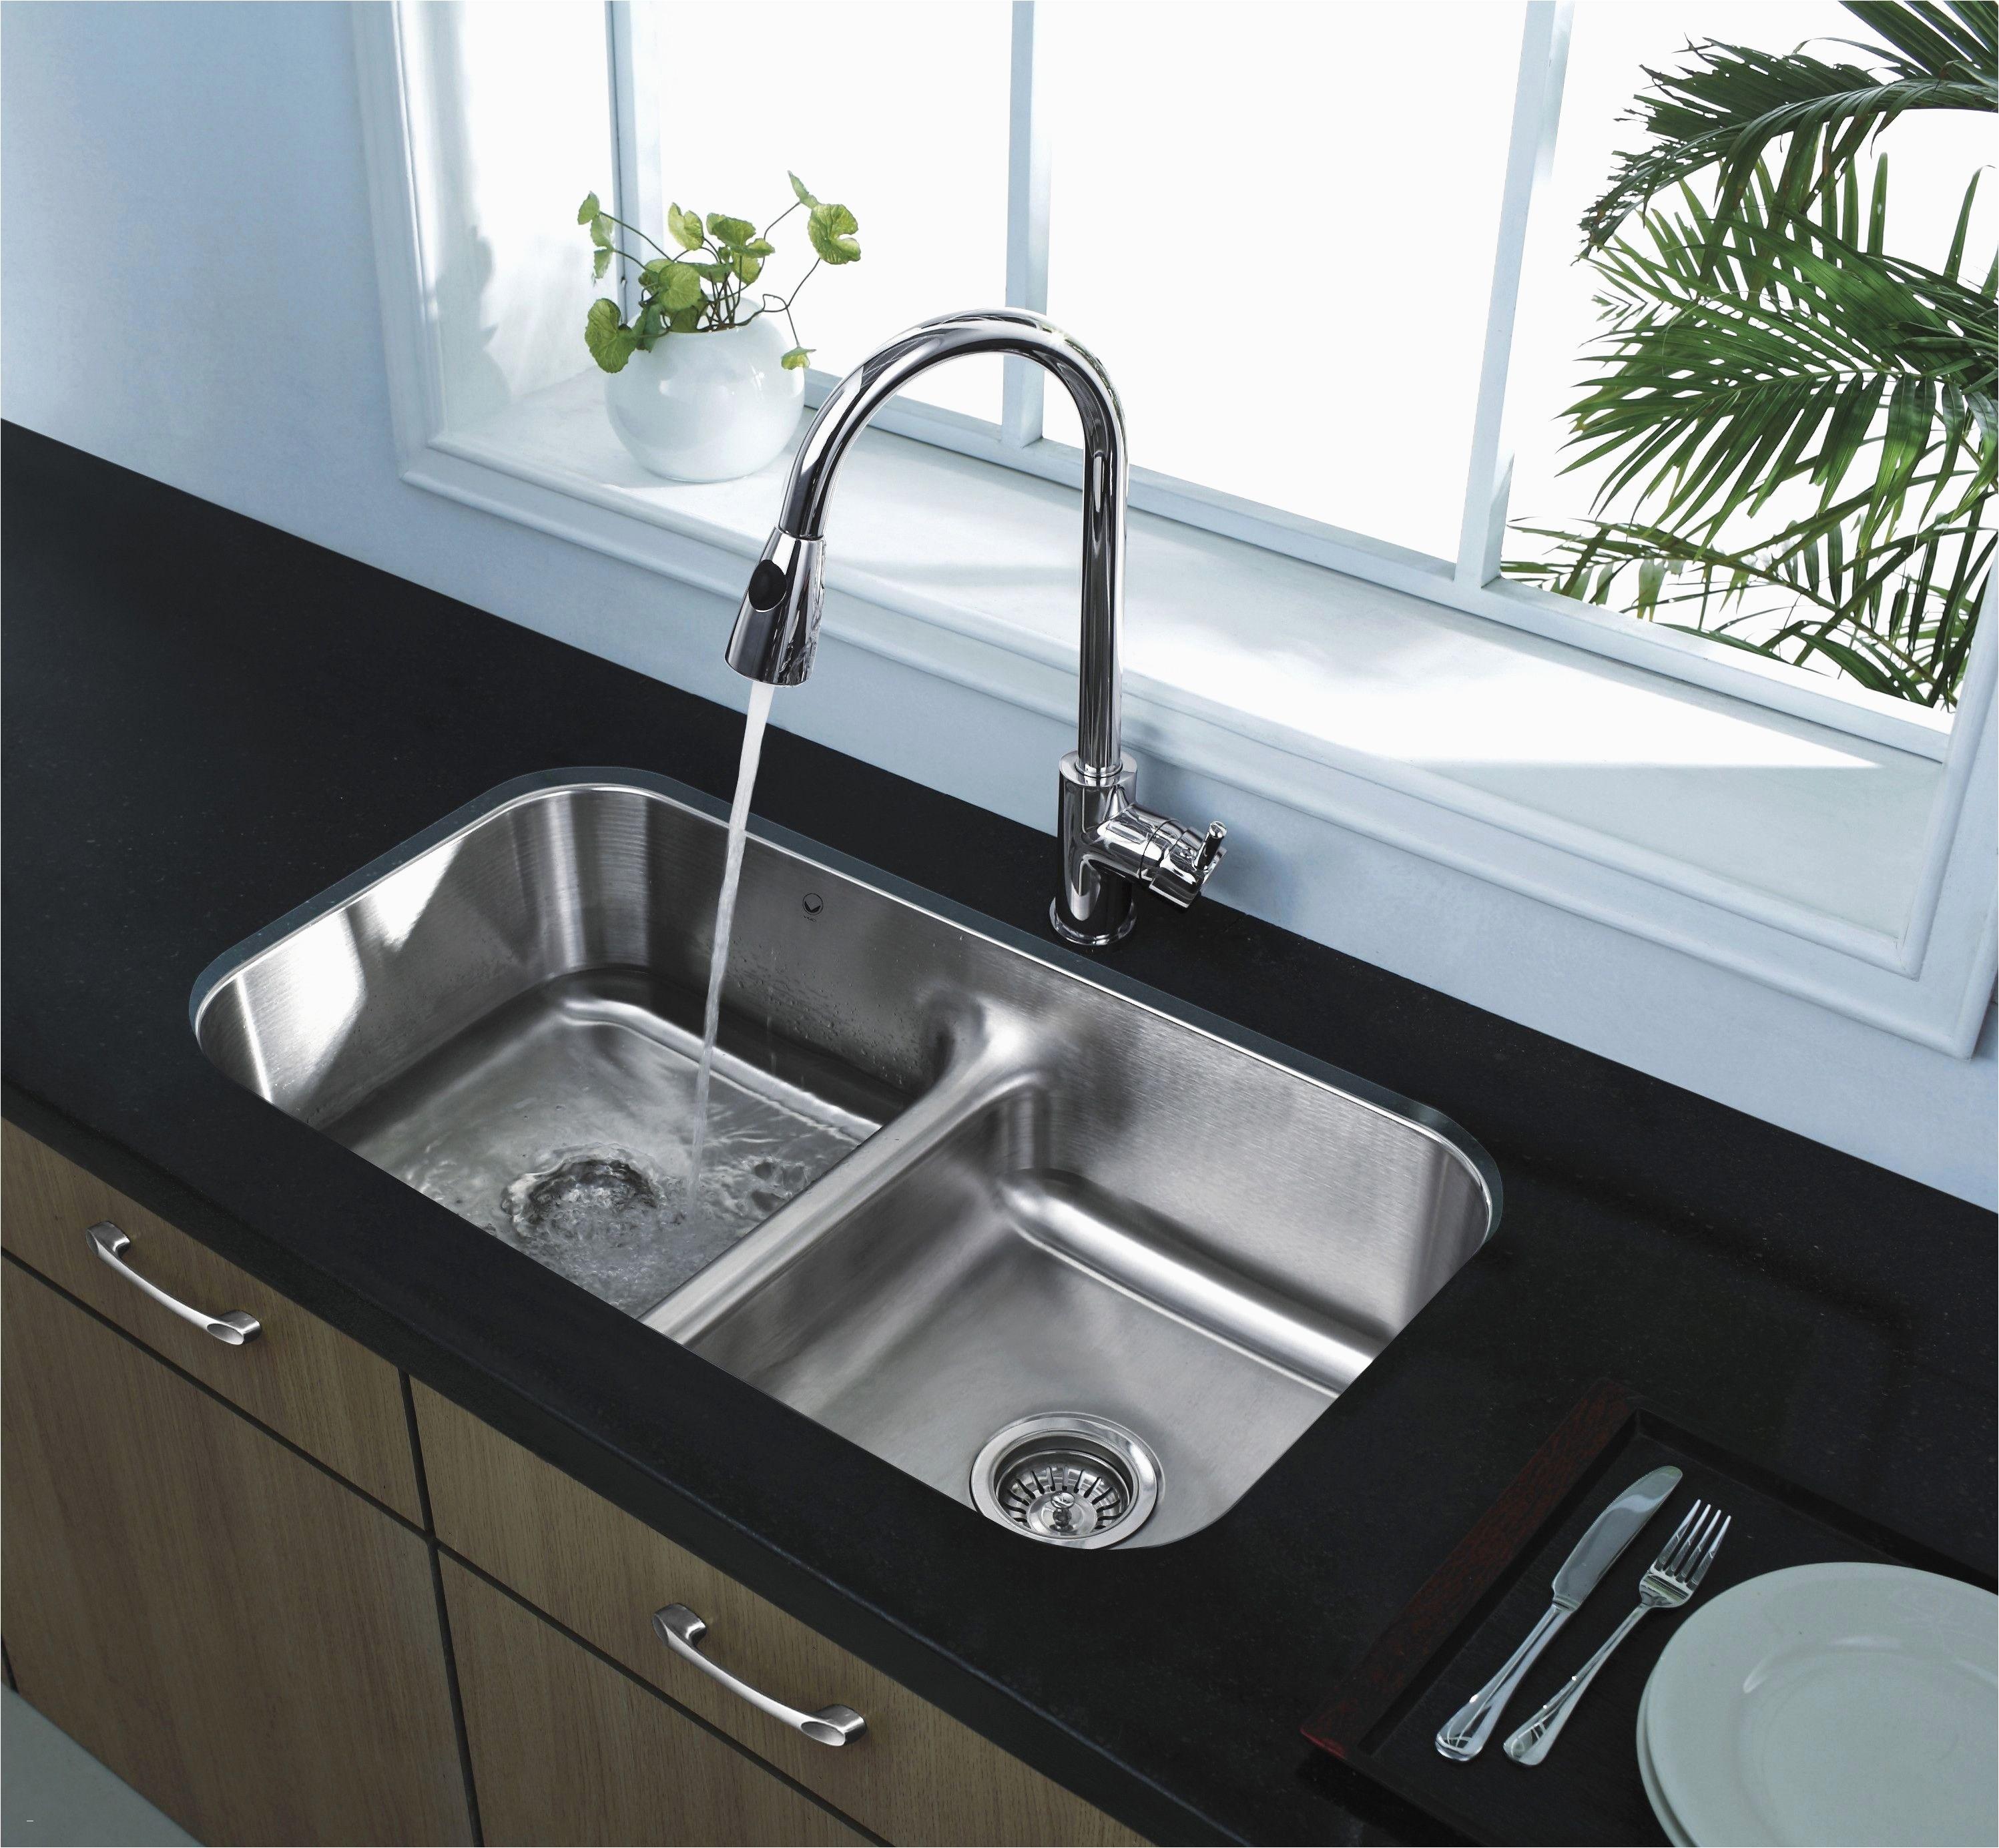 bathroom menards bathroom sinks fantastic backsplash for kitchen popular brilliant black kitchen sinks menards